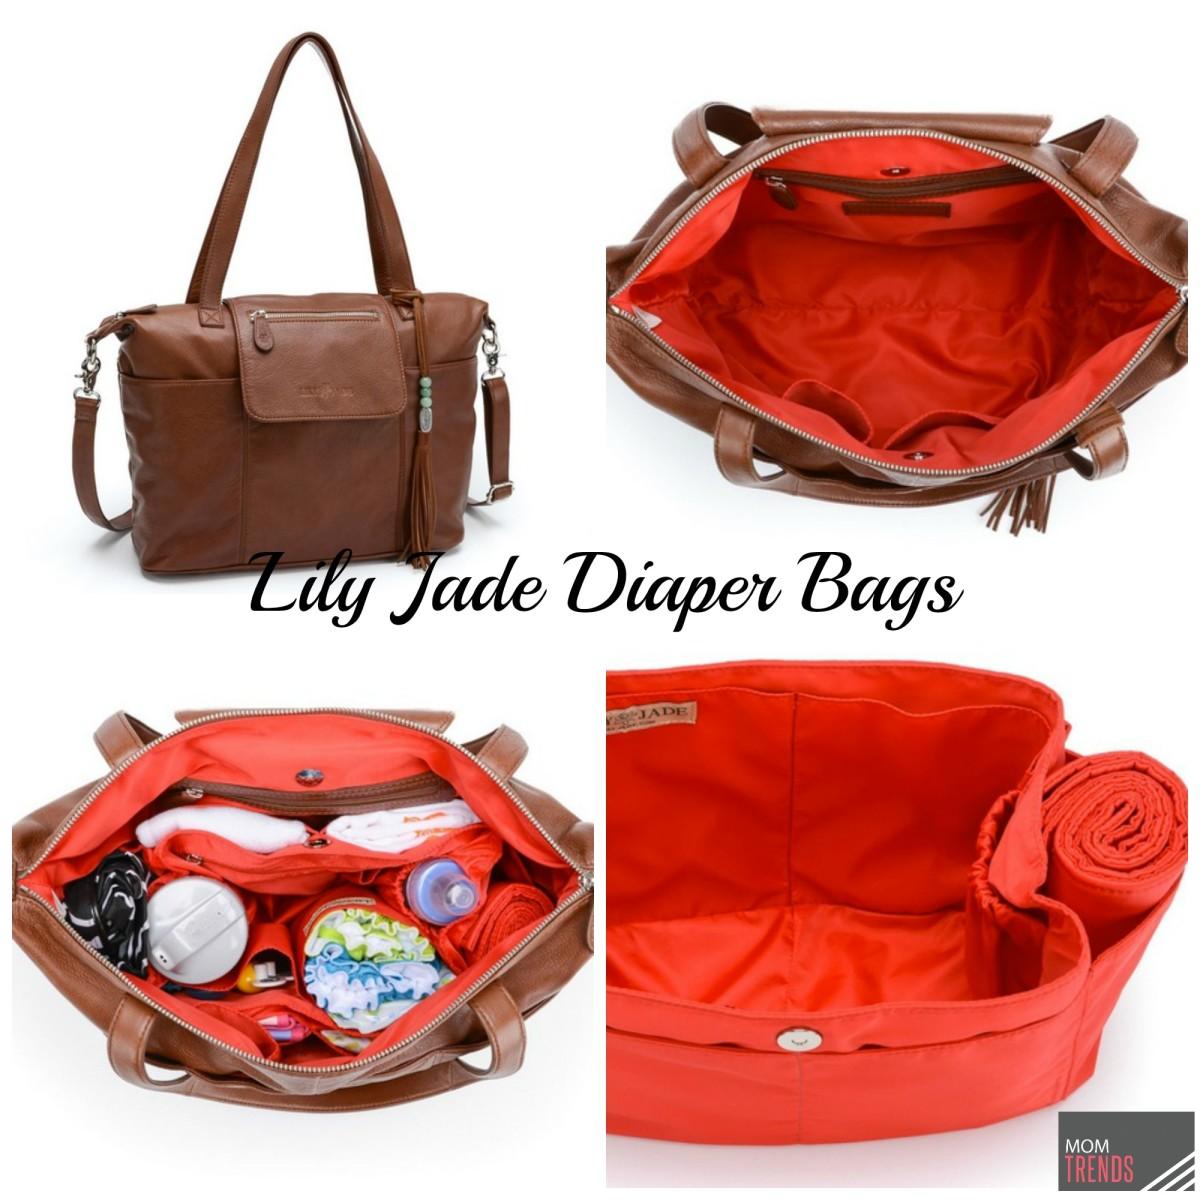 Lily Jade main